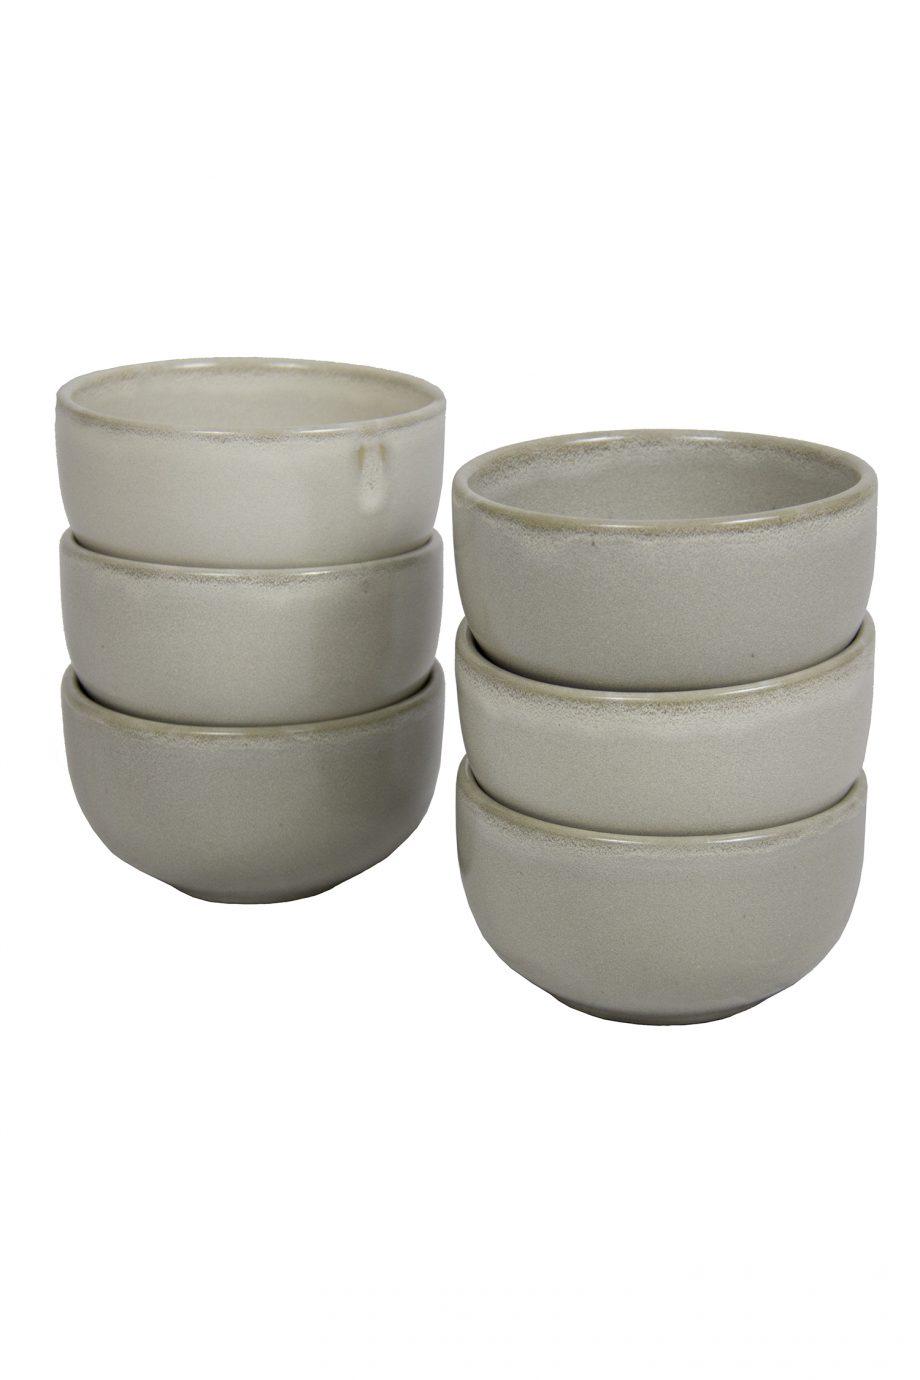 kom melk wit glaze ceramic medium